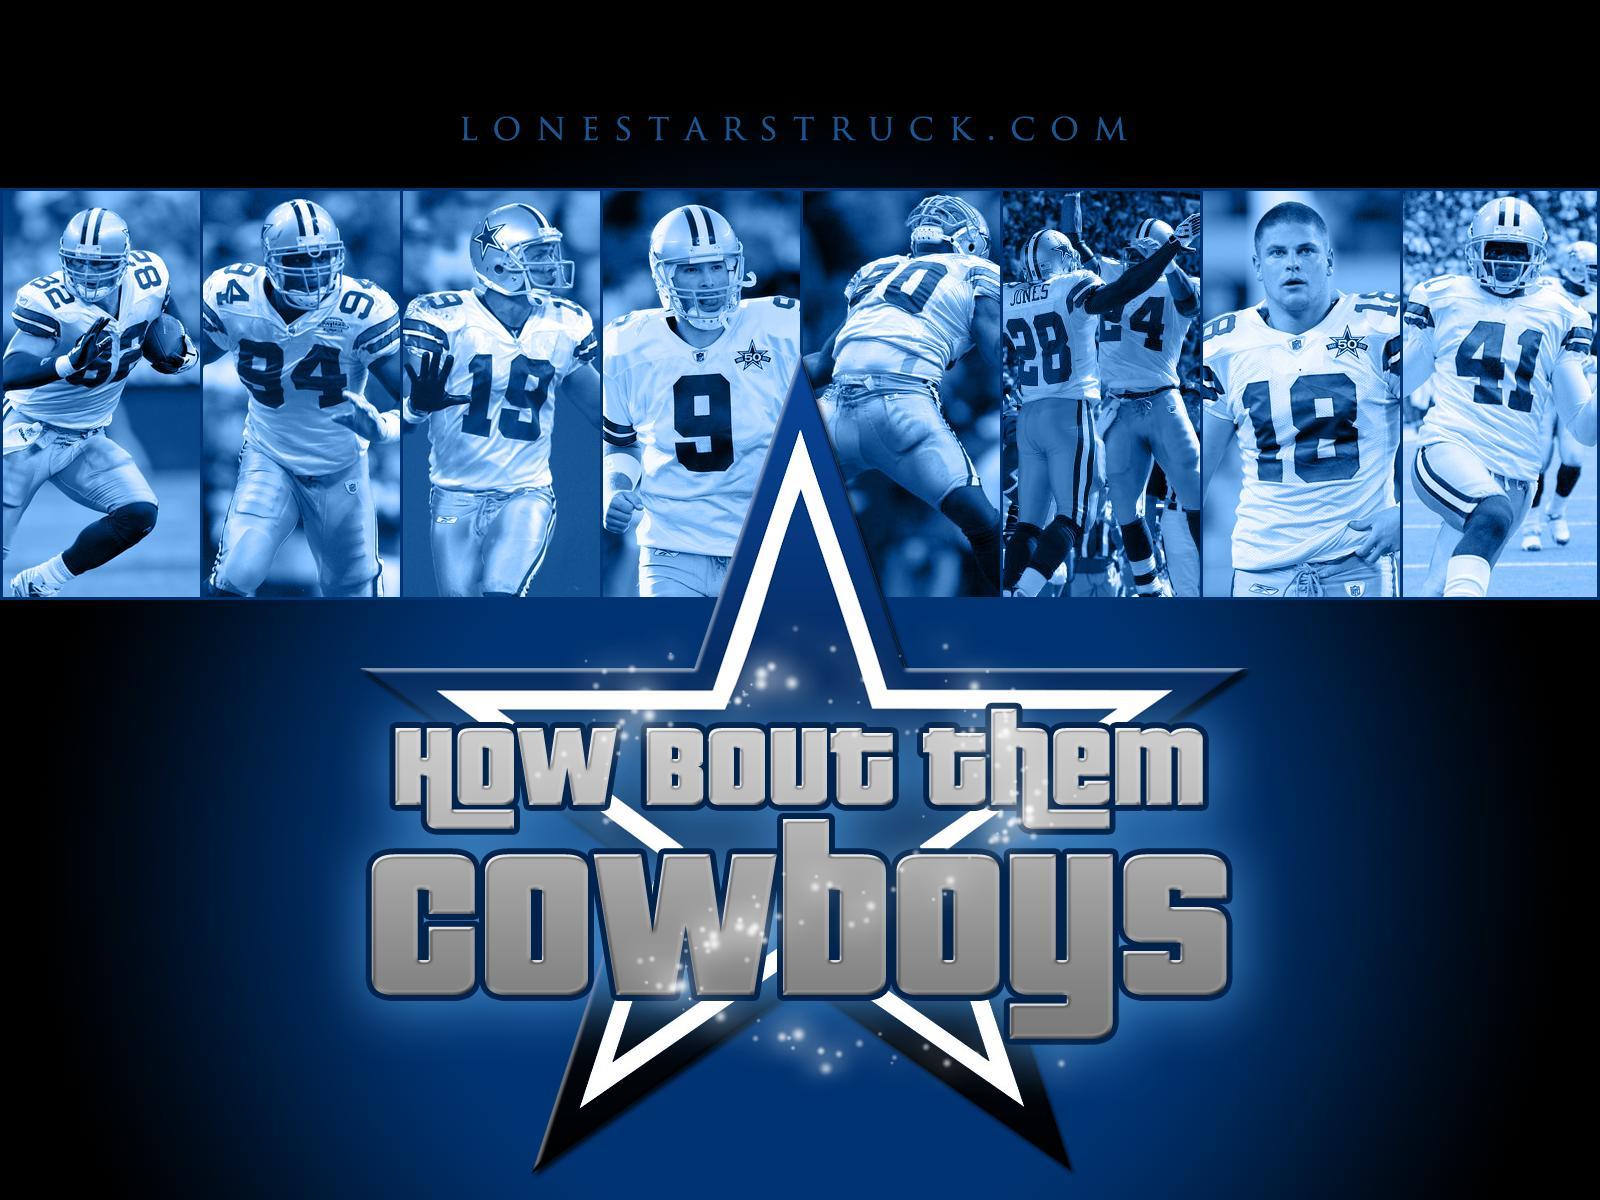 Dallas Cowboys 3d Wallpaper - High Resolution Dallas Cowboys - HD Wallpaper